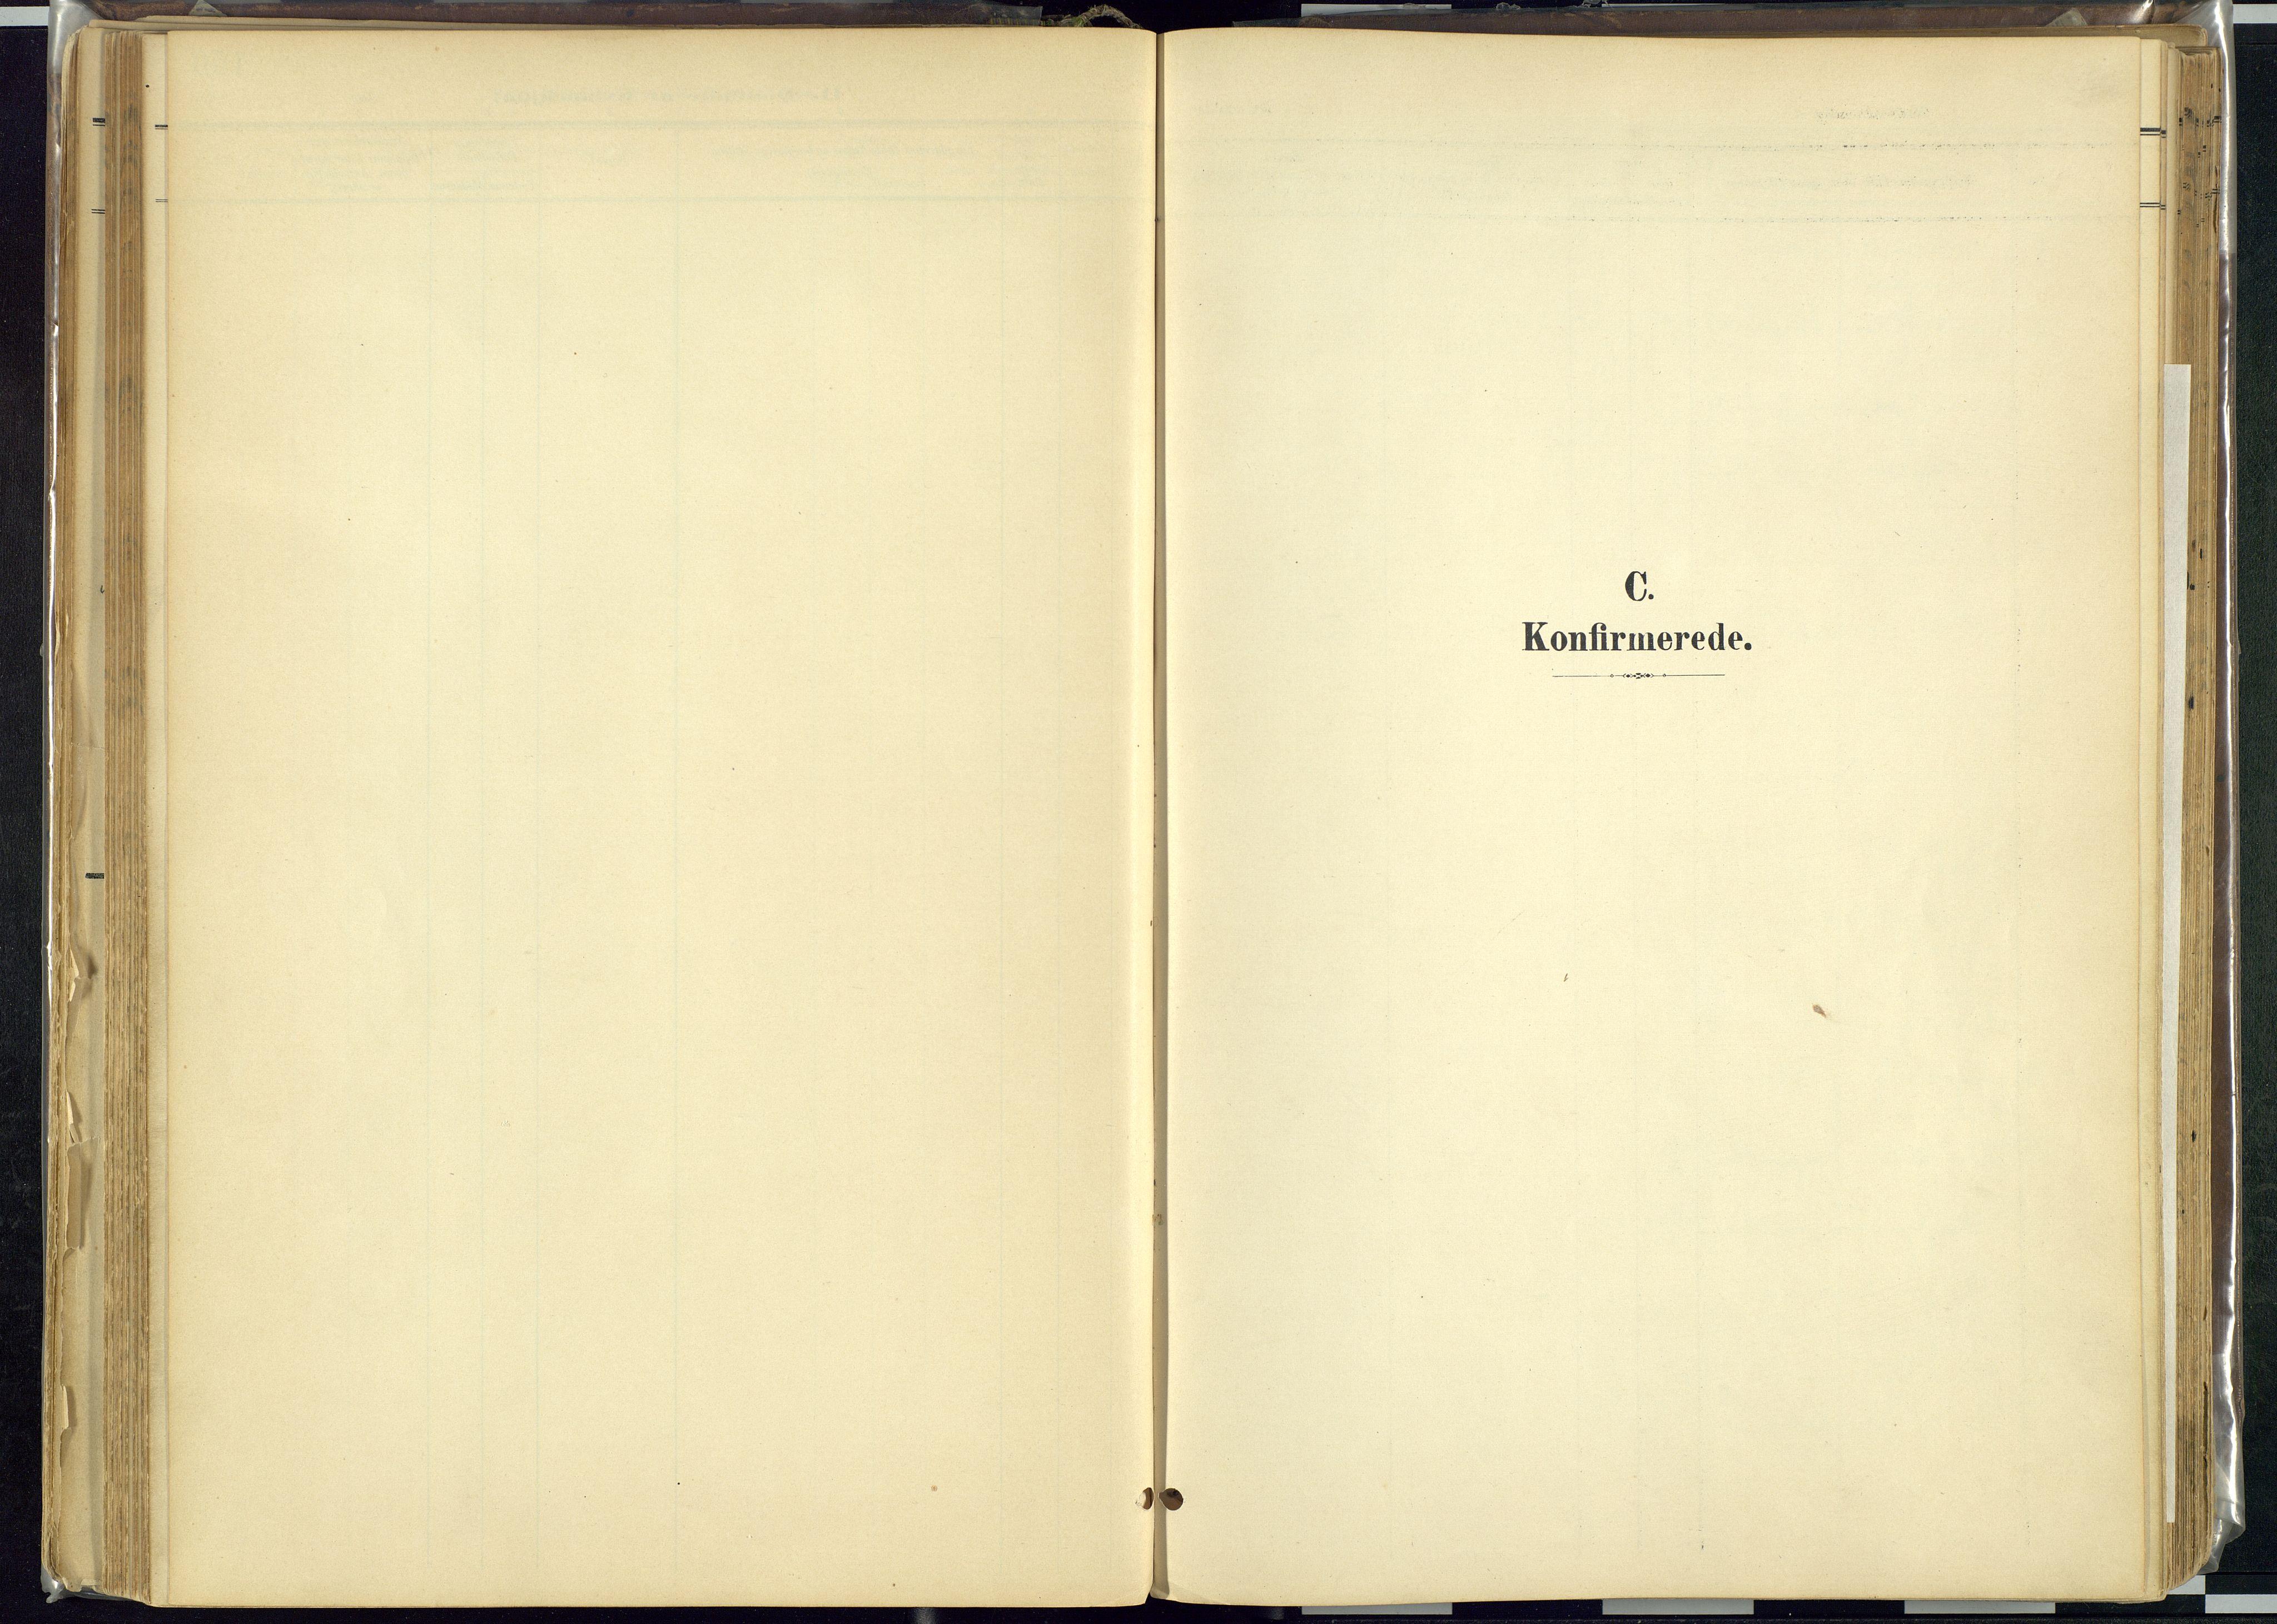 SAH, Rendalen prestekontor, H/Ha/Haa: Parish register (official) no. 12, 1901-1928, p. 145